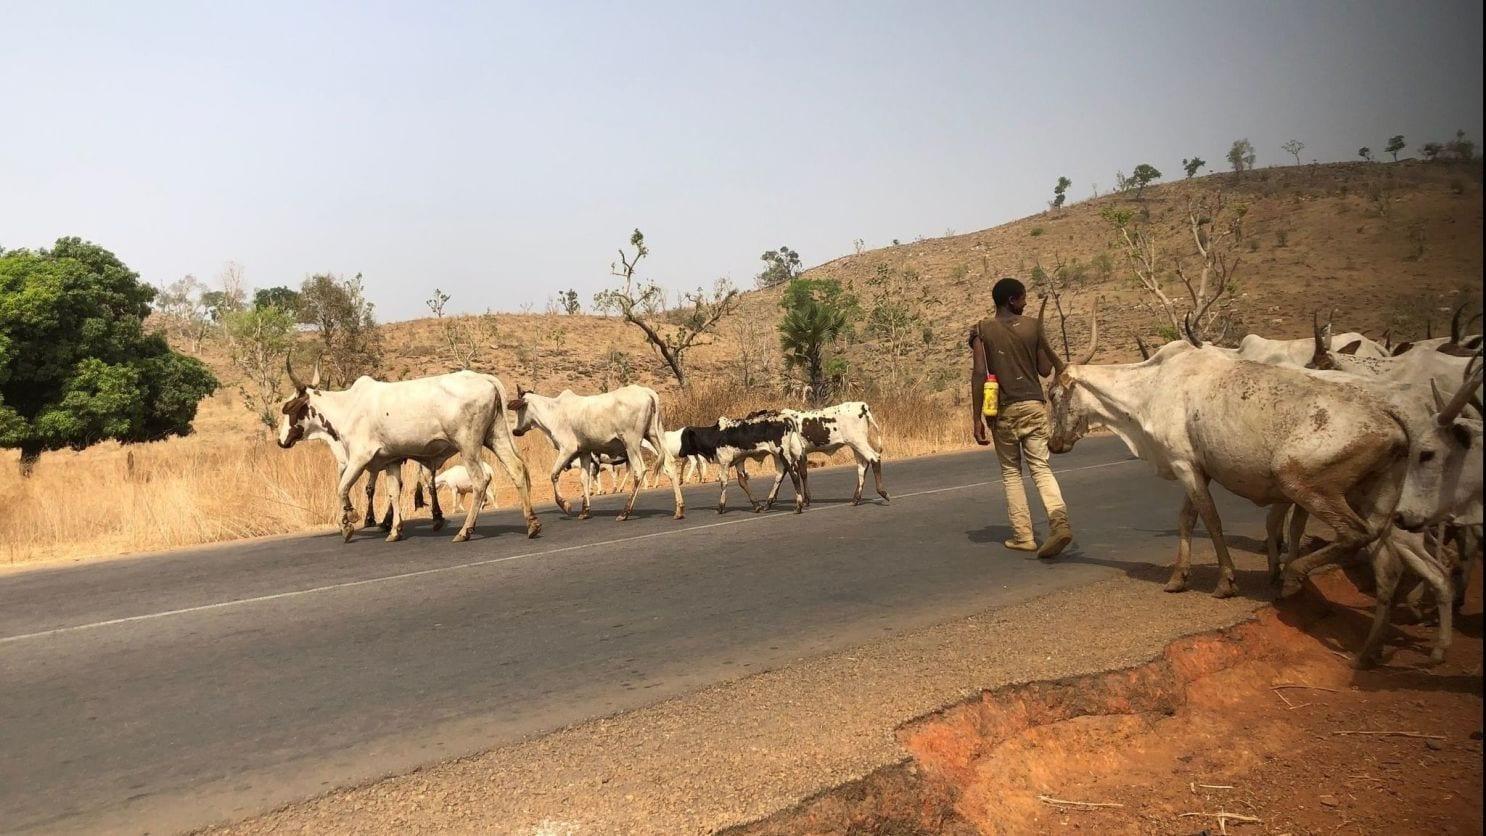 Farmers, Herders Clash Leaves At Least 14 Dead In CAR